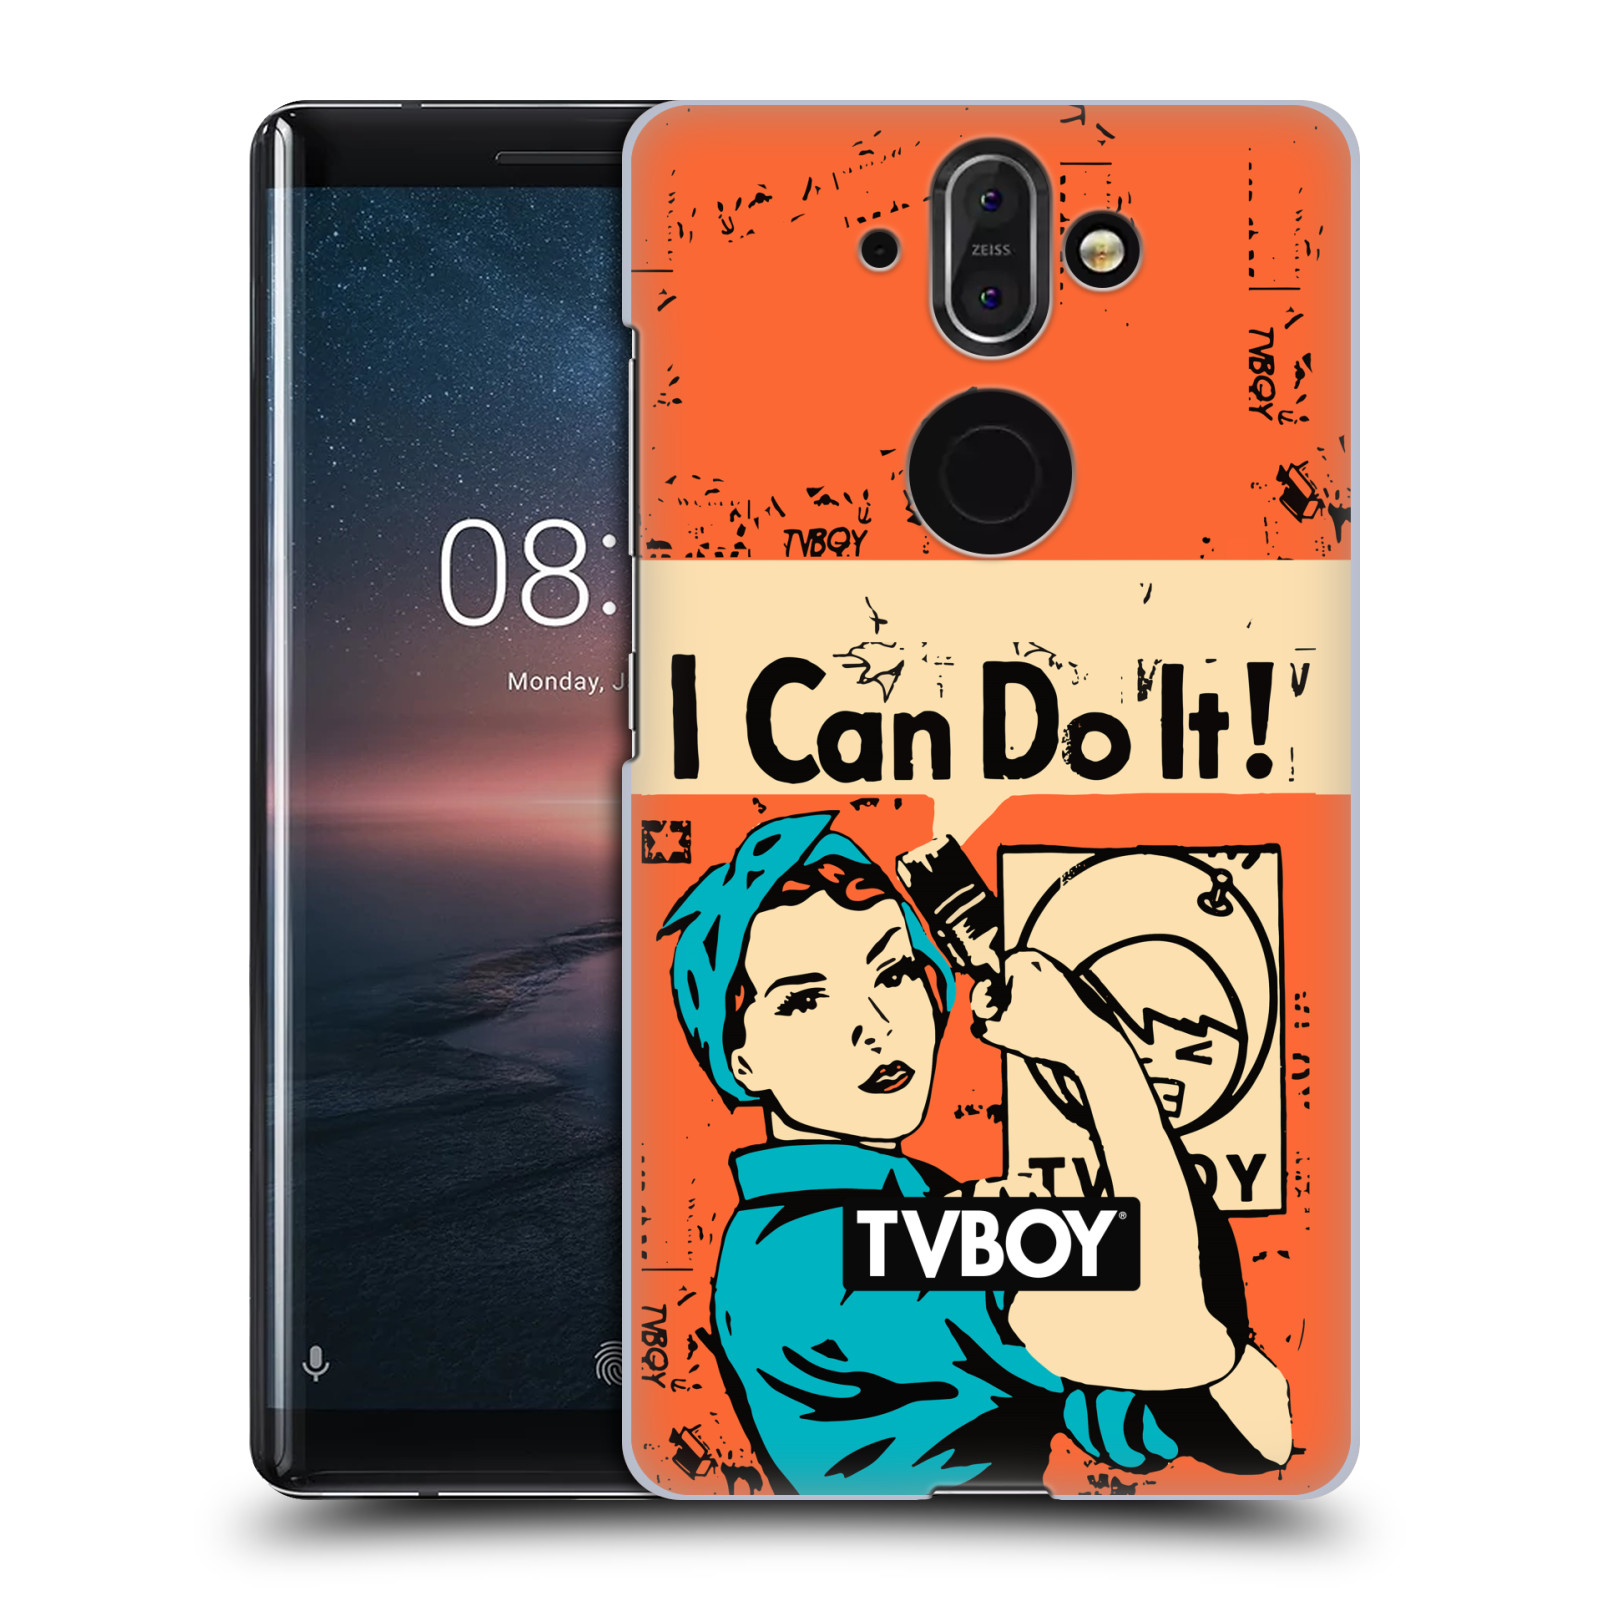 Plastové pouzdro na mobil Nokia 8 Sirocco - Head Case - TVBOY - I can do it